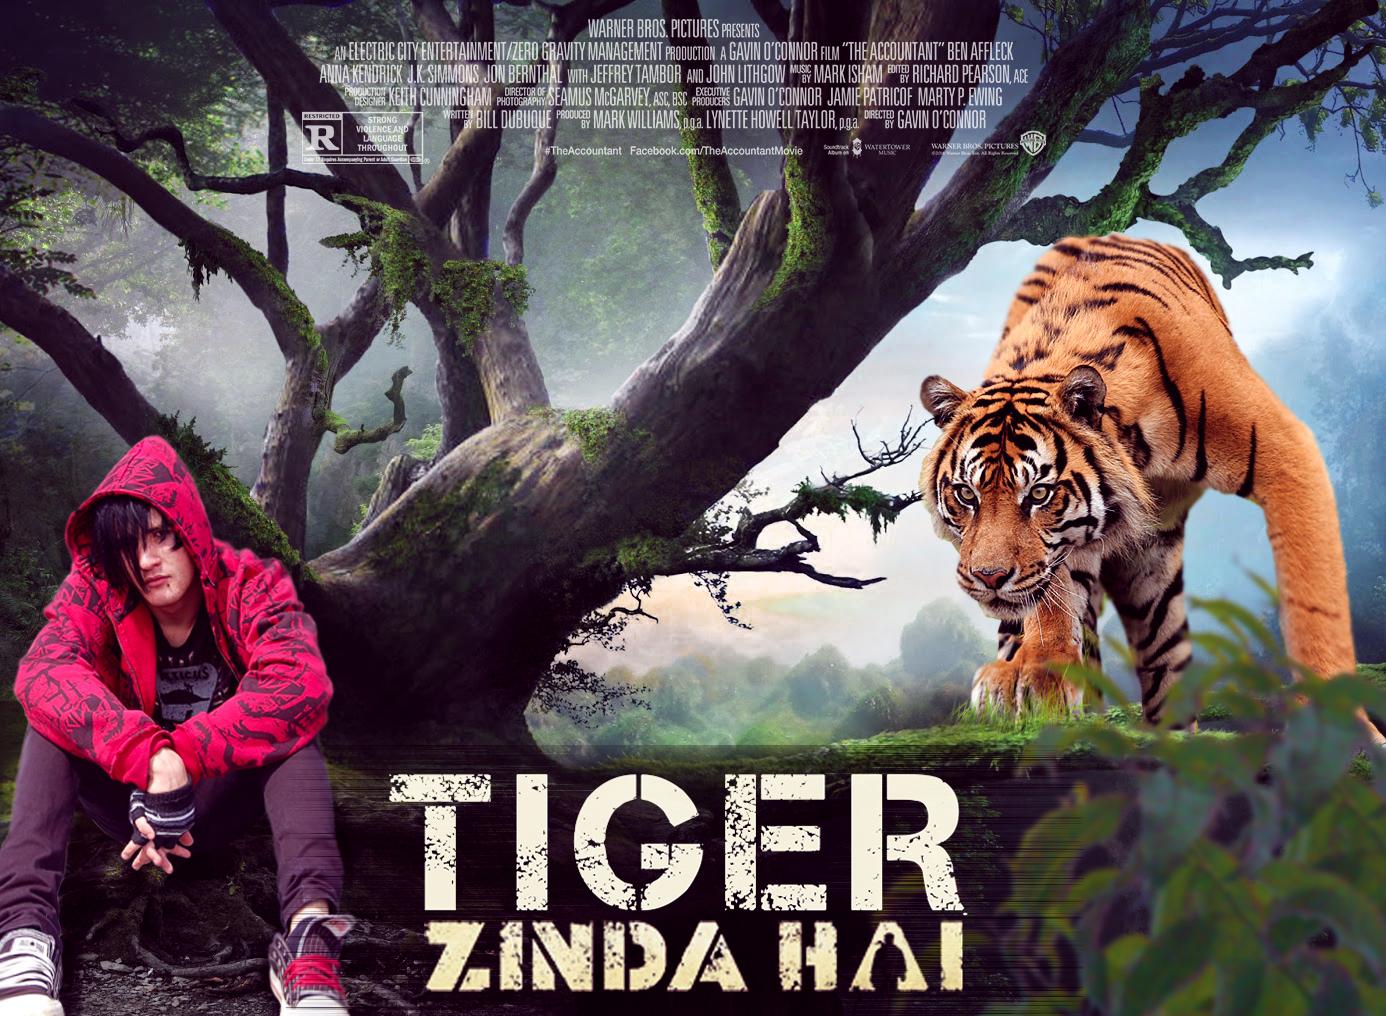 tiger zinda hai movie poster design photoshop tutorial tiger zinda hai movie poster design